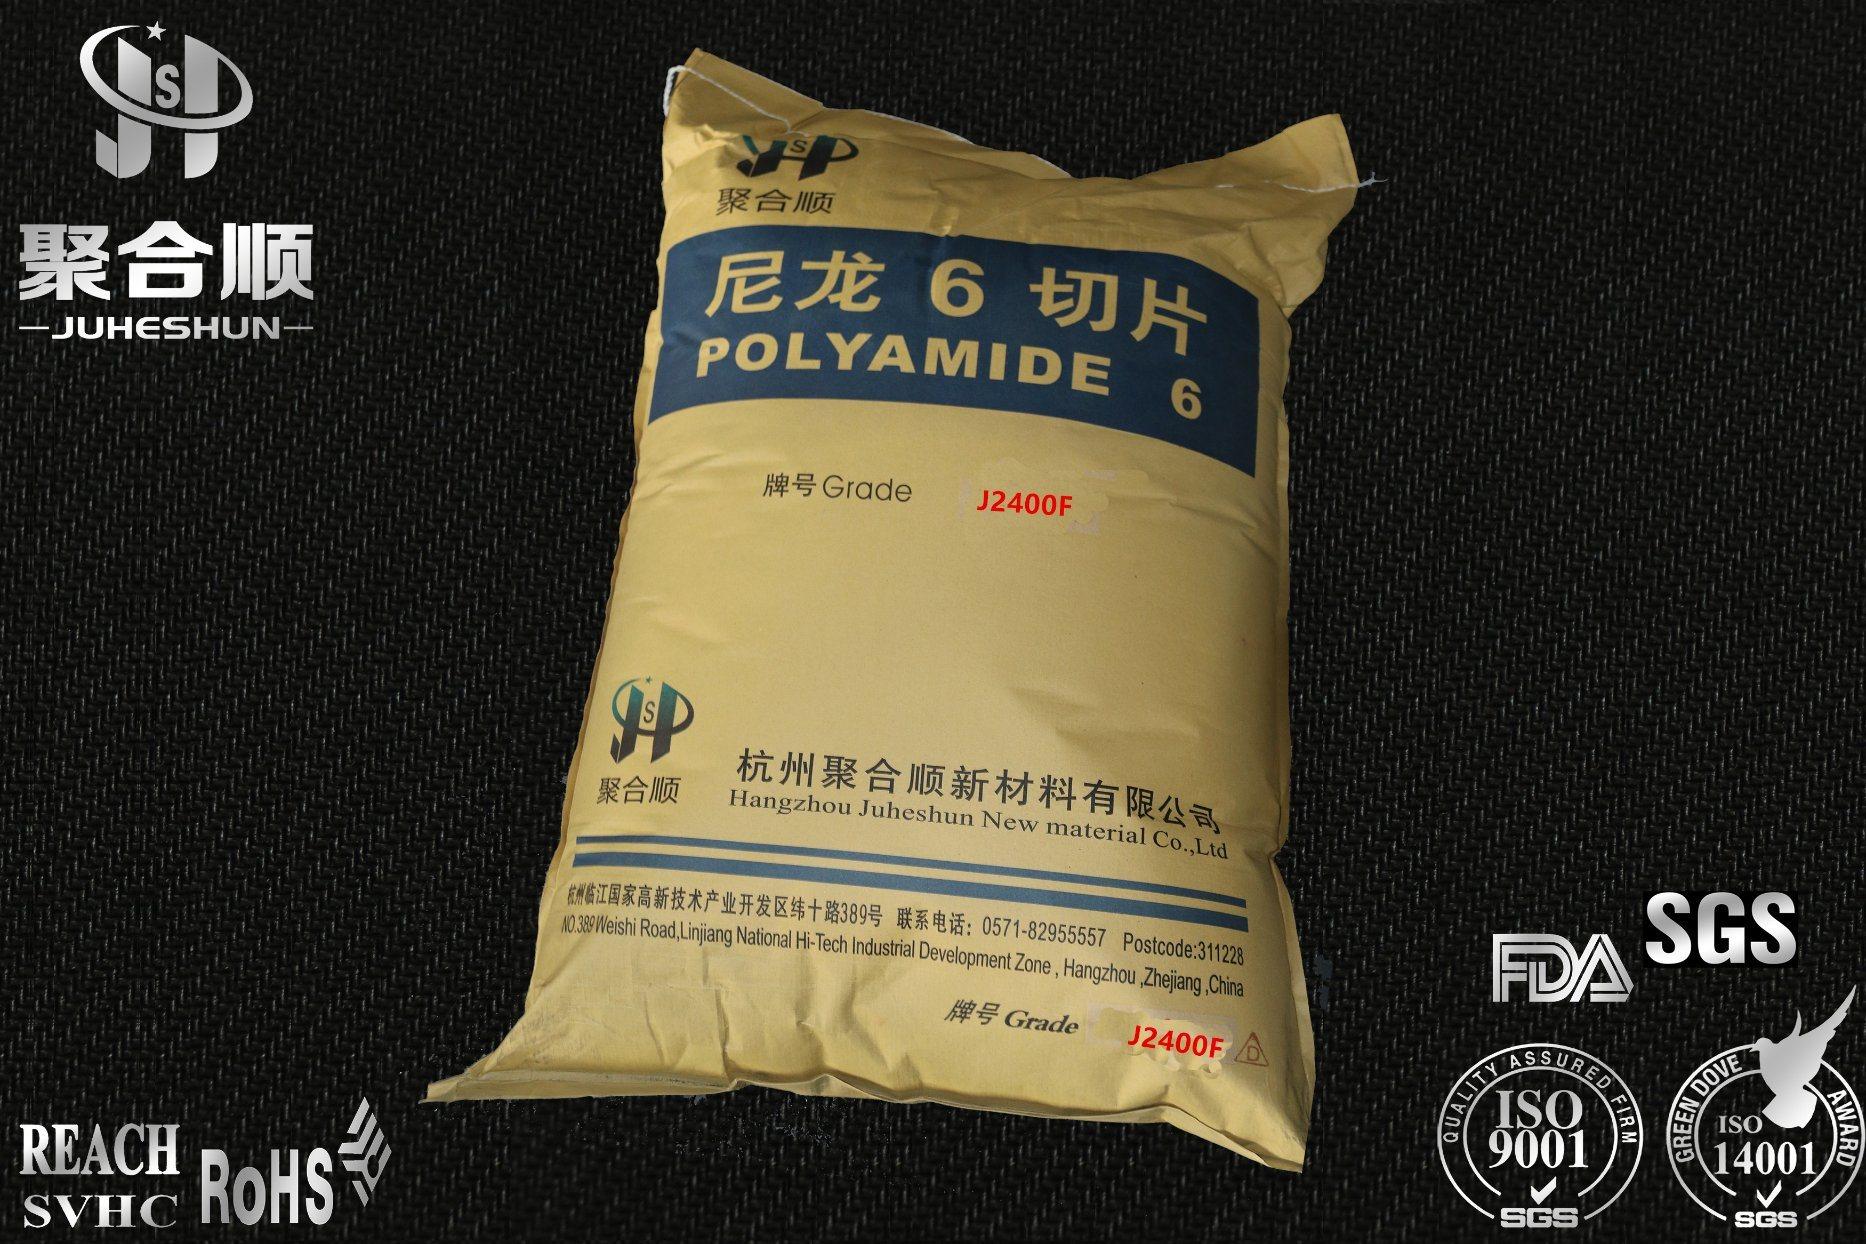 J2400f/PA6/Civilian Spinning Grade Nylon 6/Polyamide Granules/Pellets/Chips/PA6 Raw Material